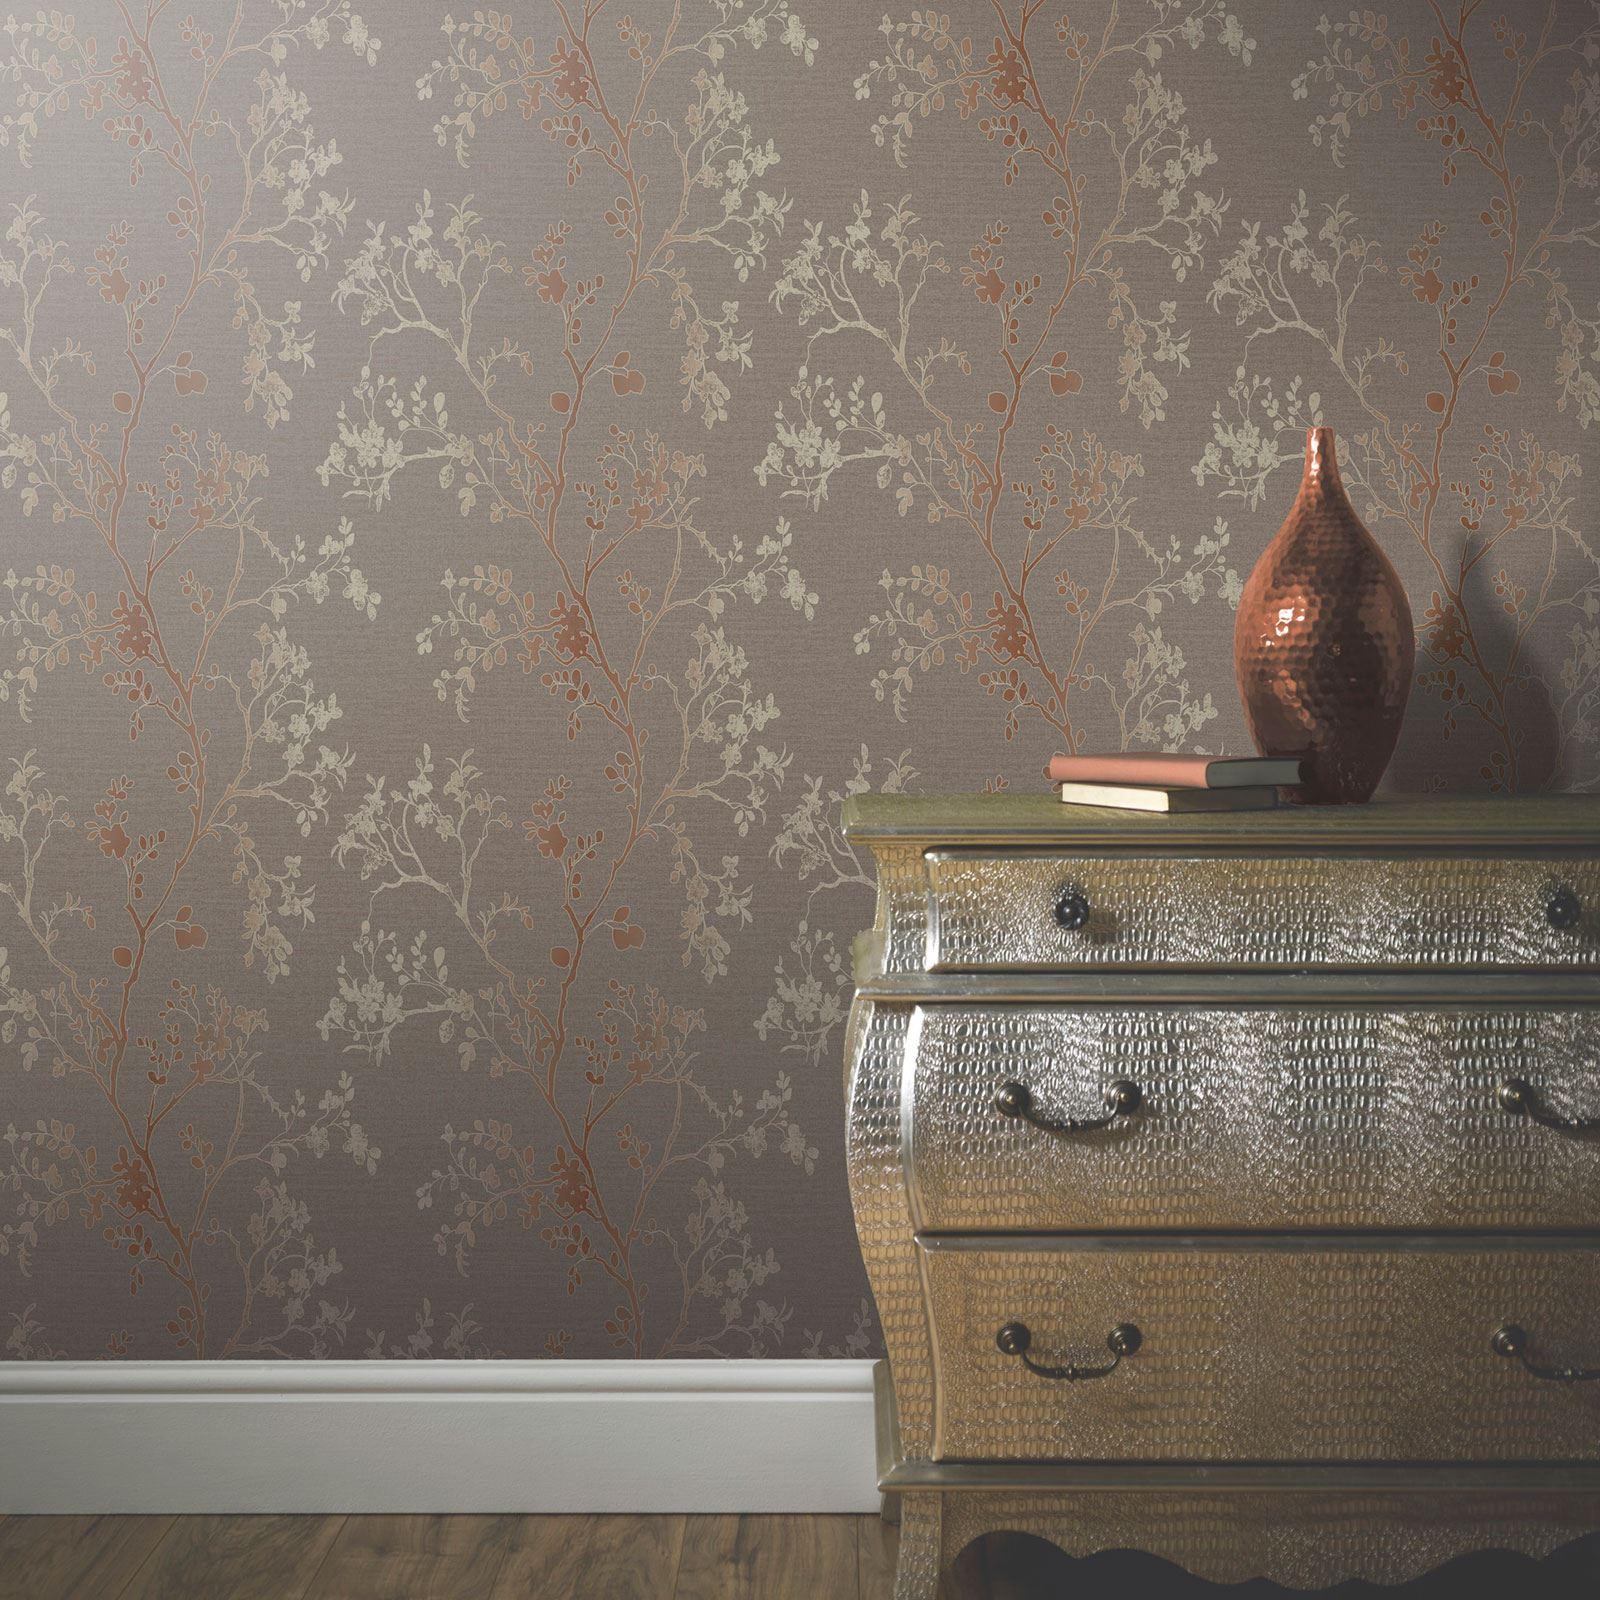 Download Wallpaper Harry Potter Rose Gold - 3a8e6b36-bb51-4387-b3d1-de135ae7a57c  Graphic_726725.jpg